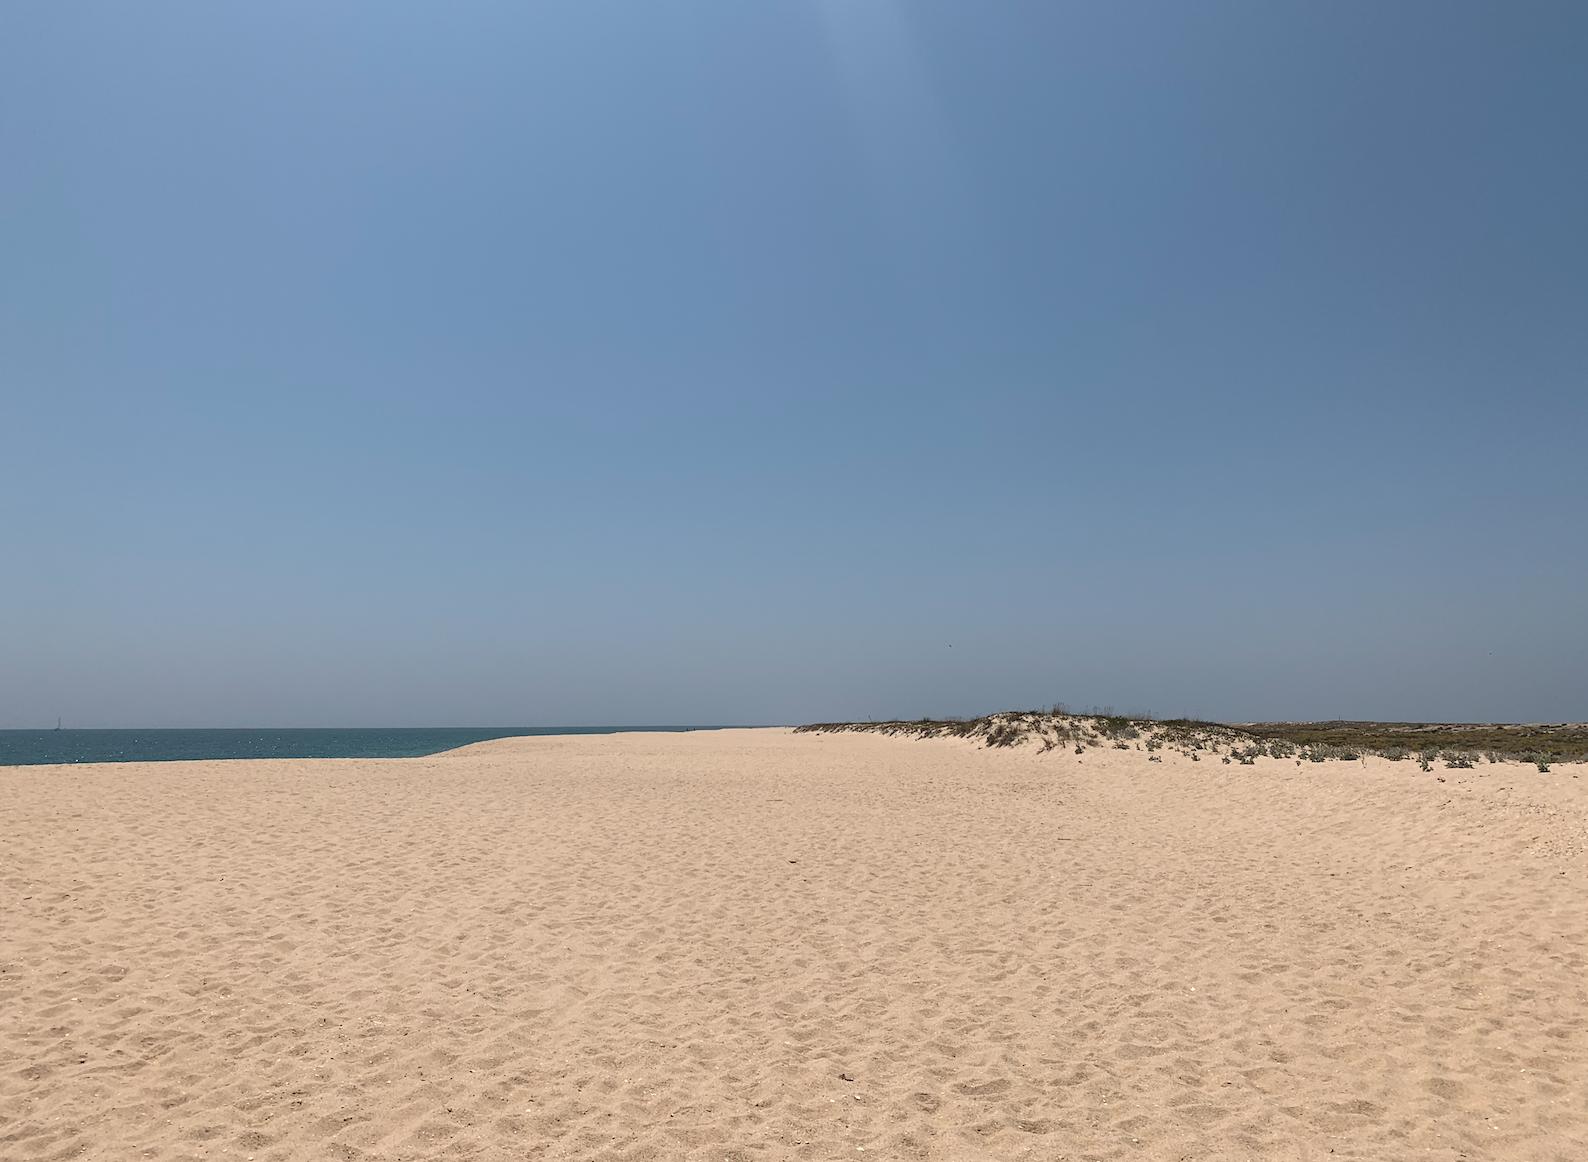 Deserta Island in Portugal